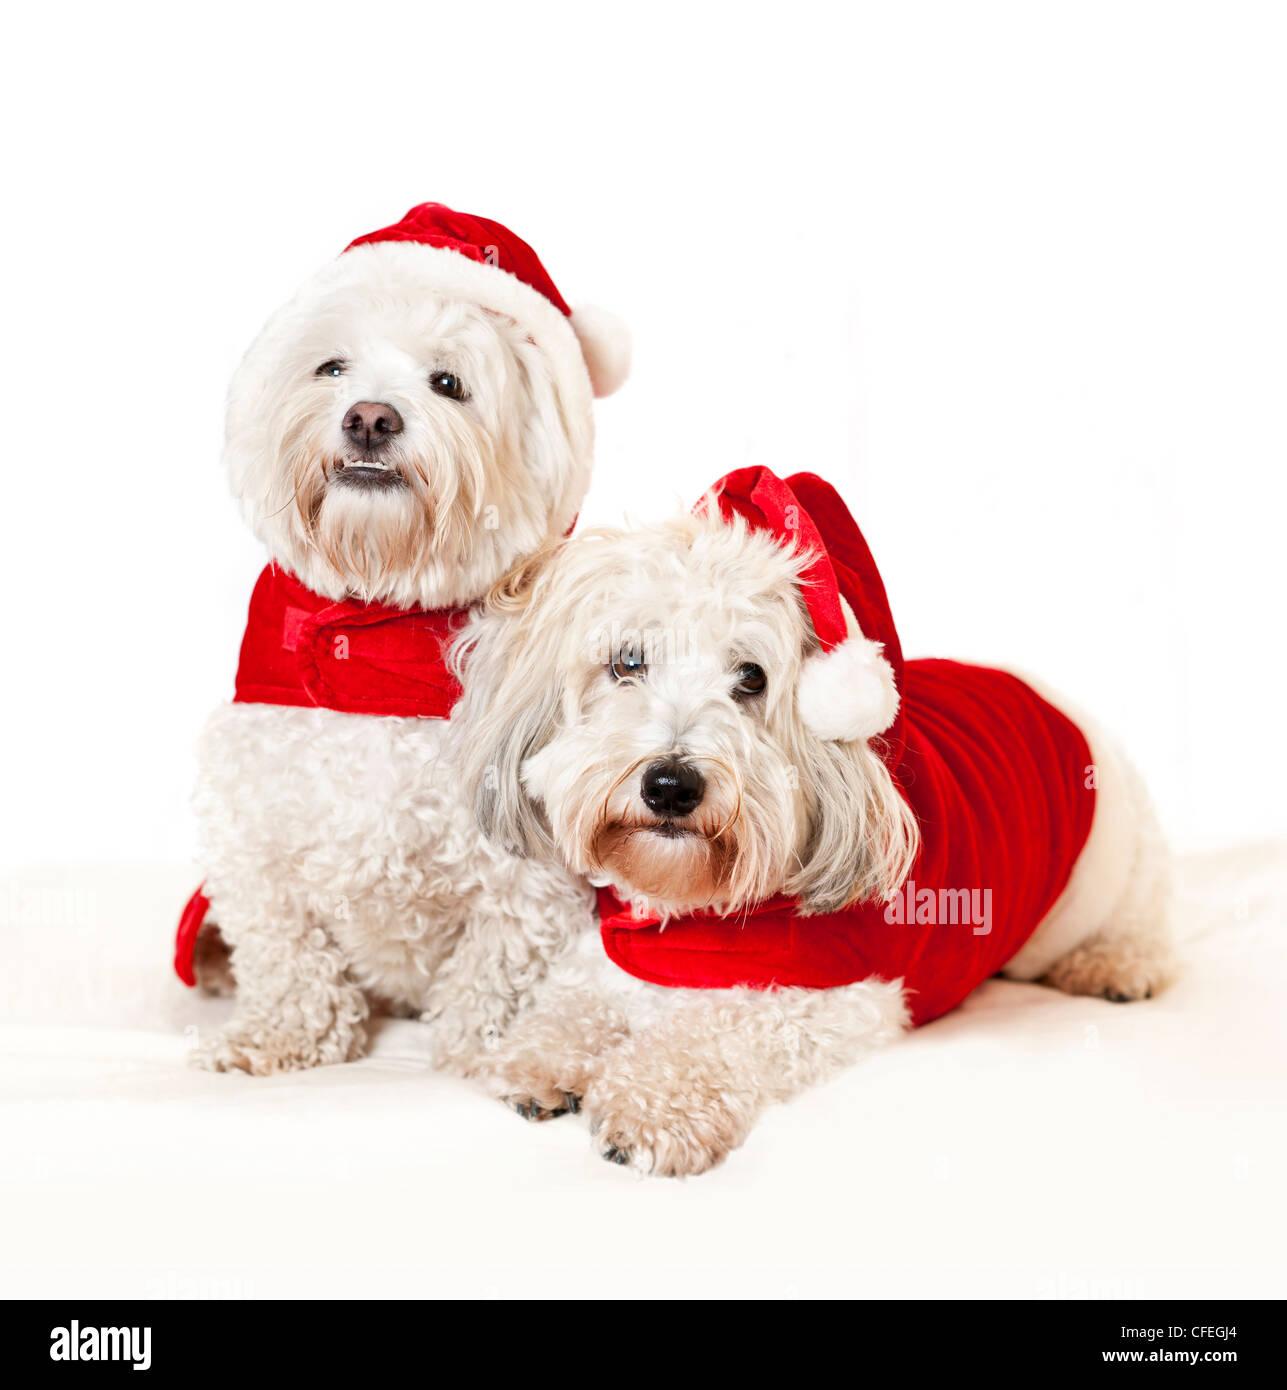 Two adorable coton de tulear dogs wearing santa costumes - Stock Image